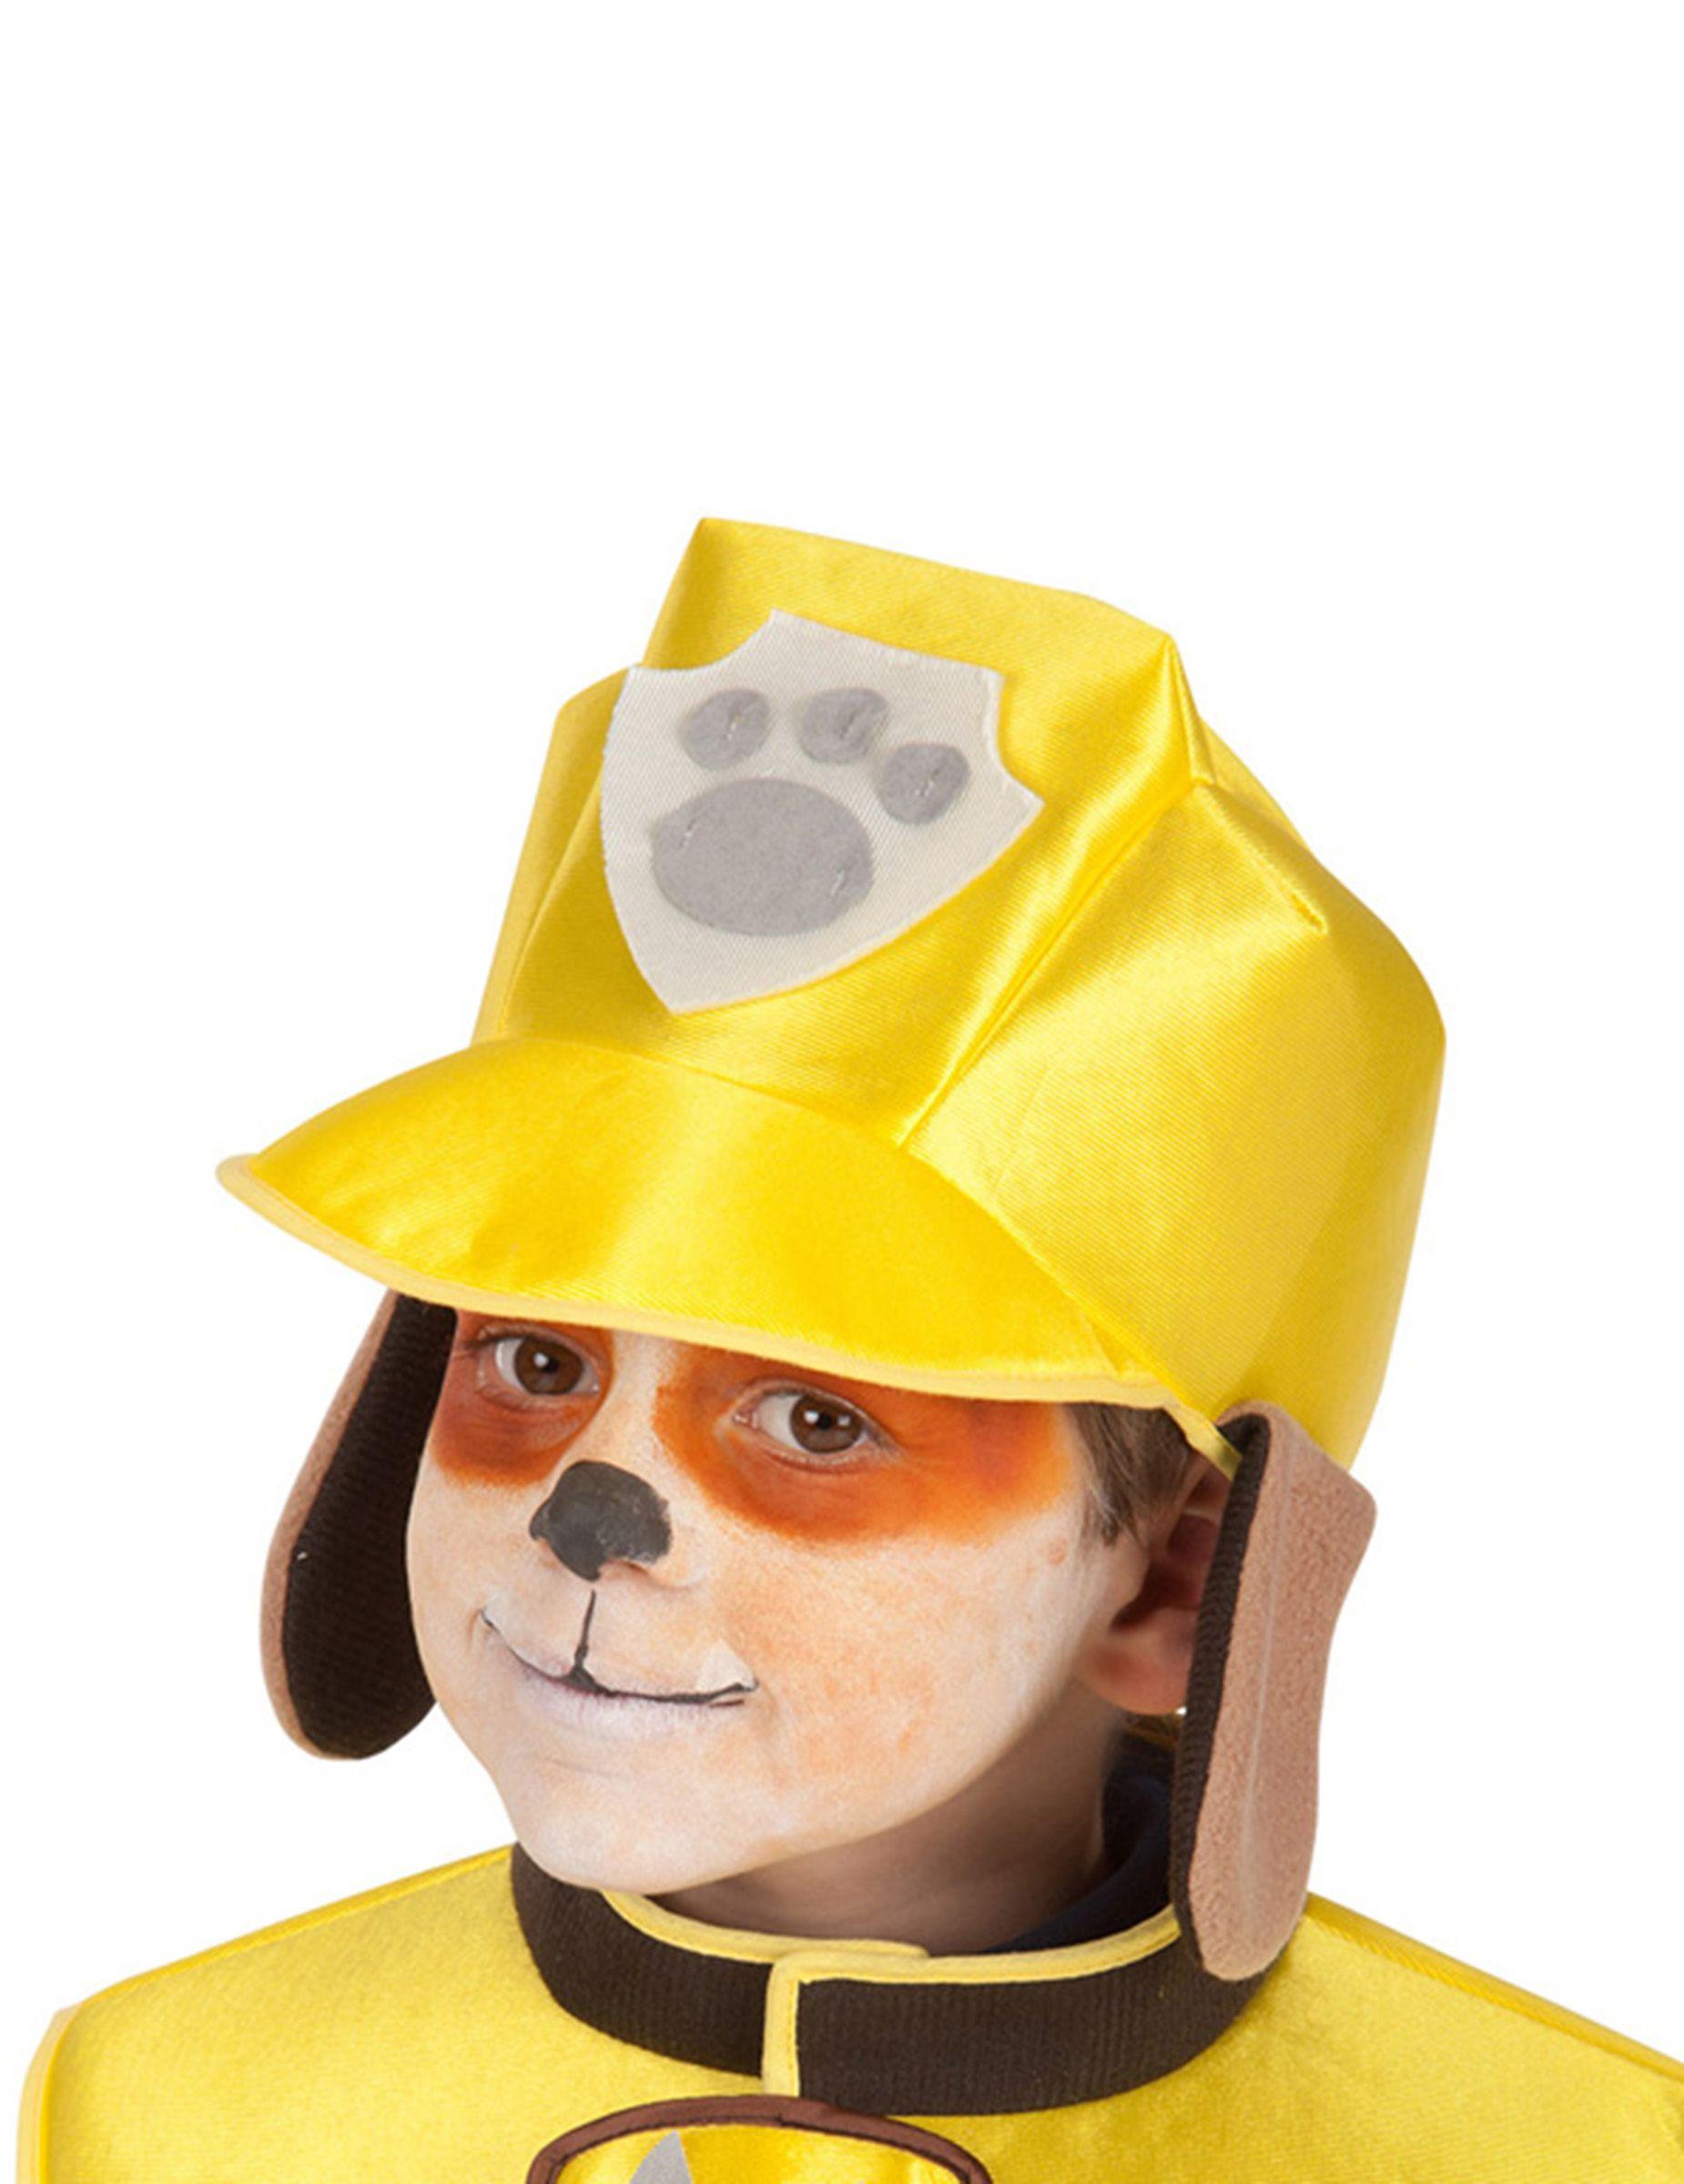 Paw Patrol Rubble Mutze Fur Kinder Lizenzware Gelb Gunstige